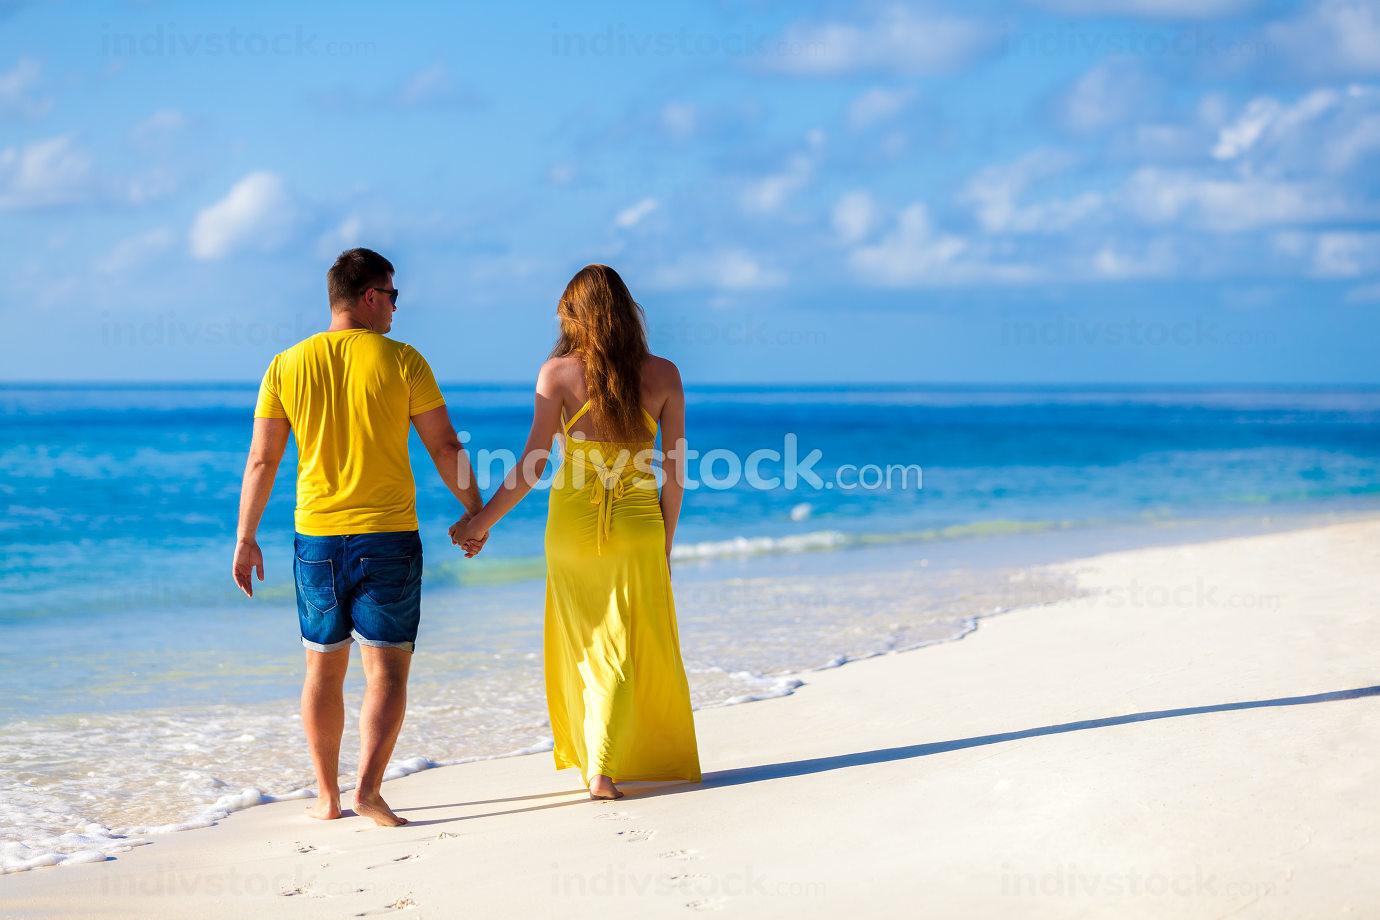 Maldives, a couple walking along the beach